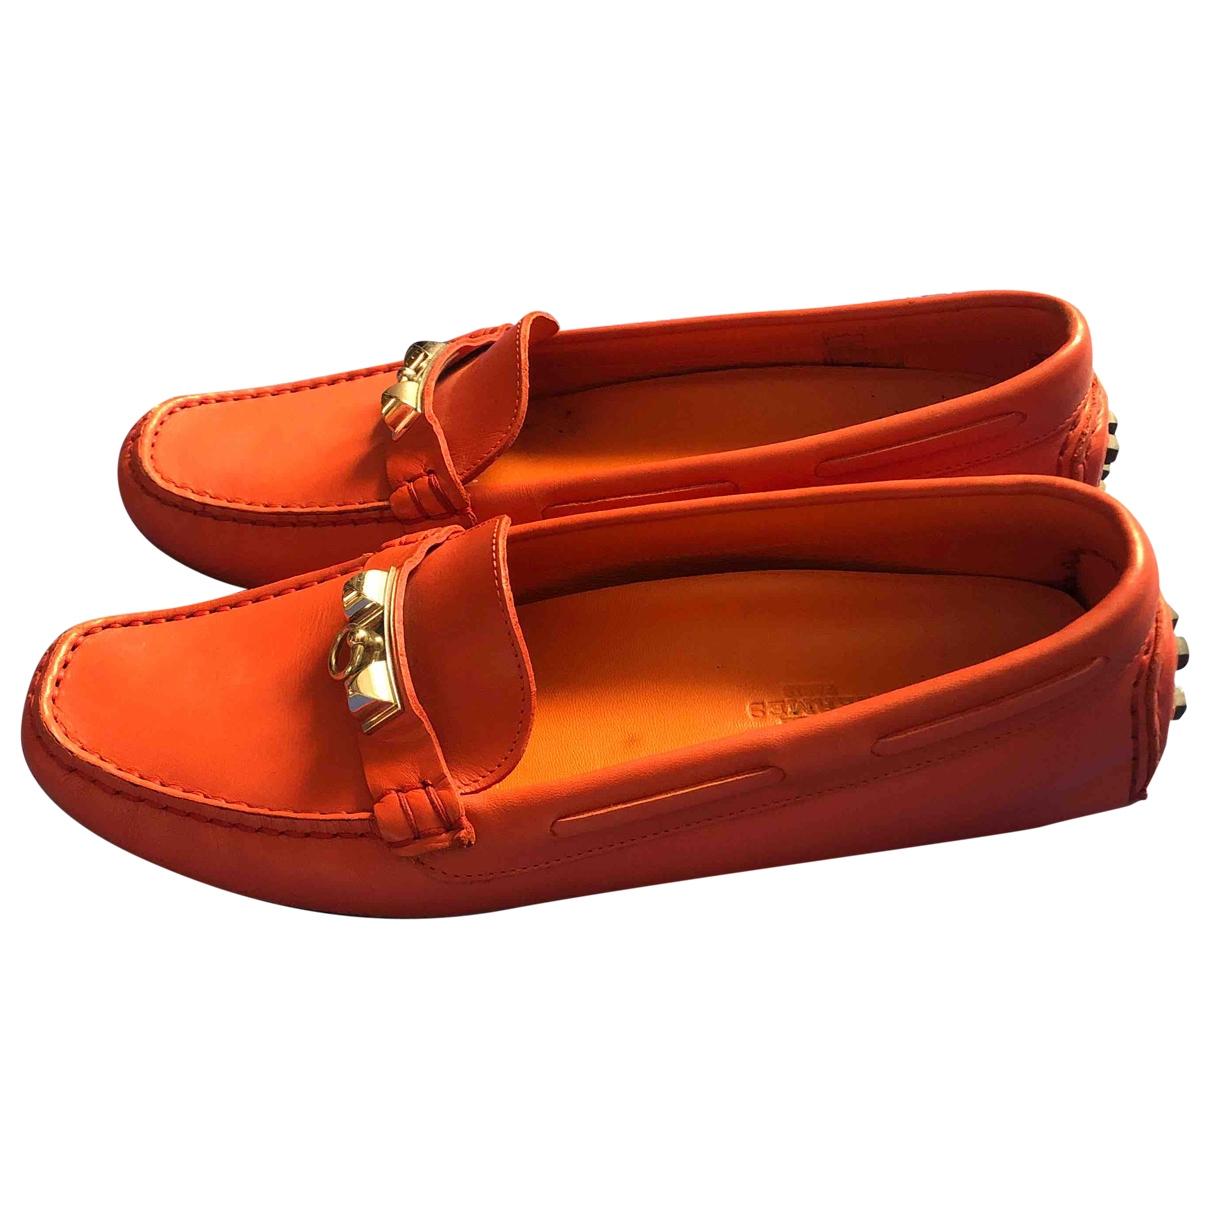 Hermès Irving Orange Leather Flats for Women 36 EU